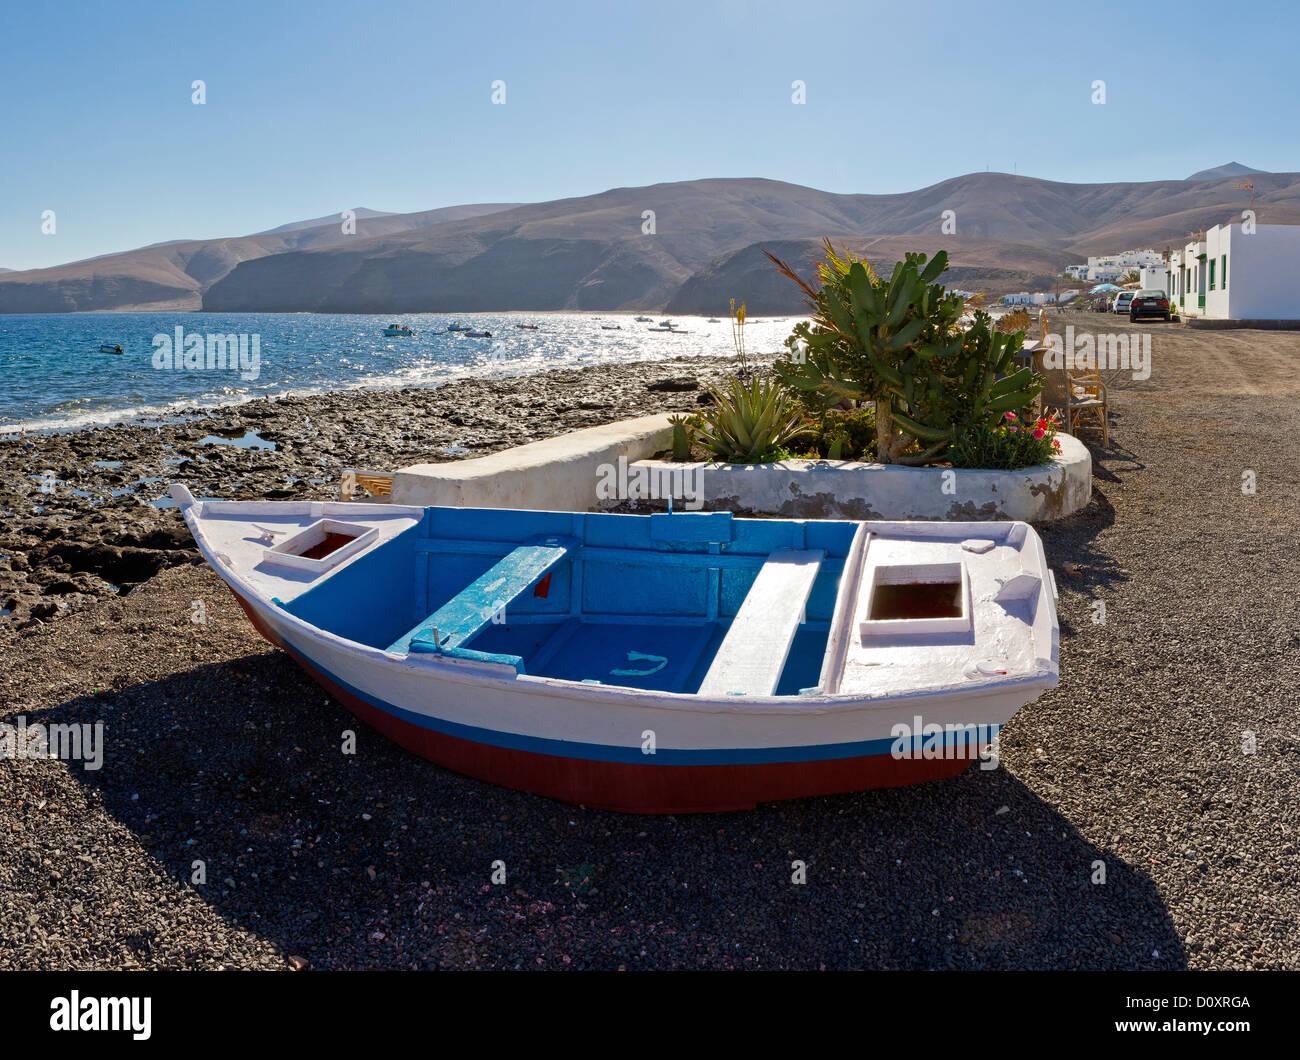 Spain, Lanzarote, Playa Quemada, Fishing dinghy, city, village, water, summer, mountains, sea, Canary Islands, - Stock Image